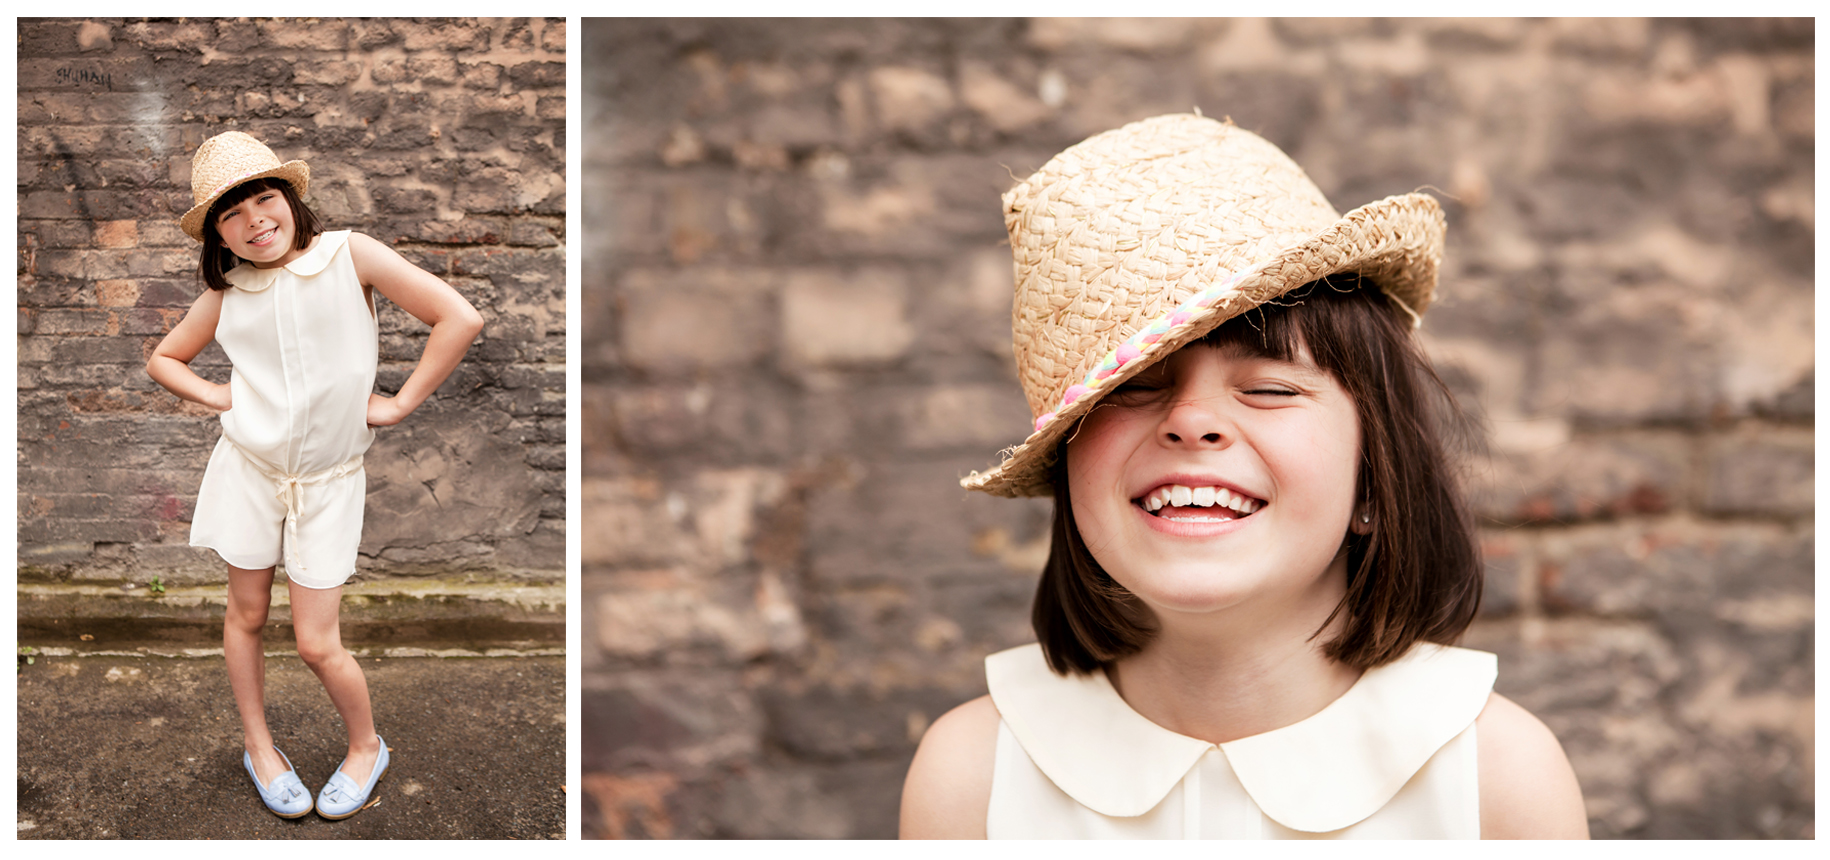 Clare J Sheridan Photography - Girl wearing straw hat